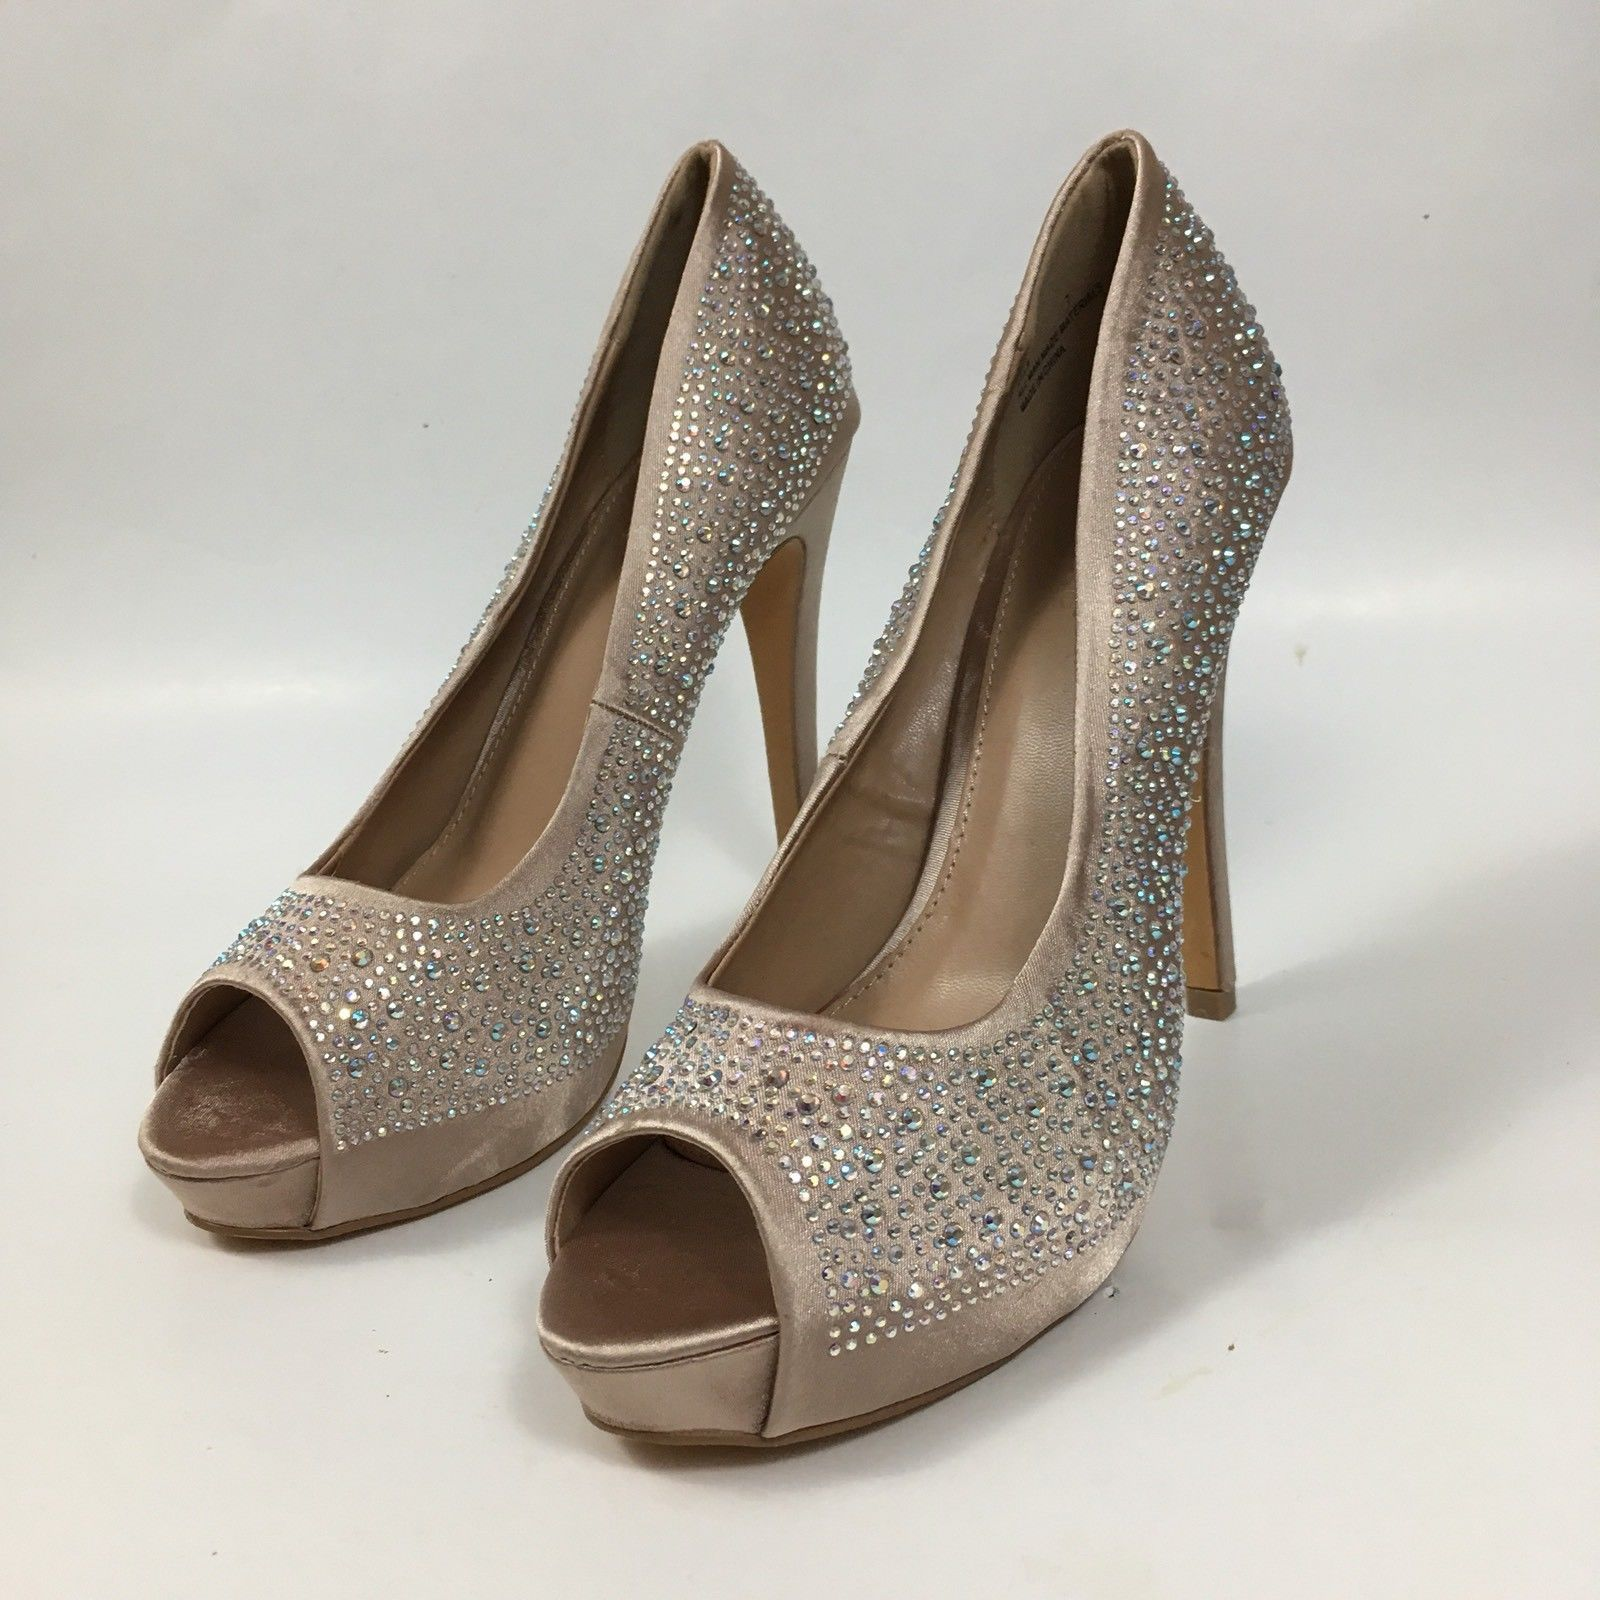 c4769d9d5311 S l1600. S l1600. Previous. Charlotte Russe Women s Sz 7 Ella High Heel  Shoes Embellished Open Peep Toe